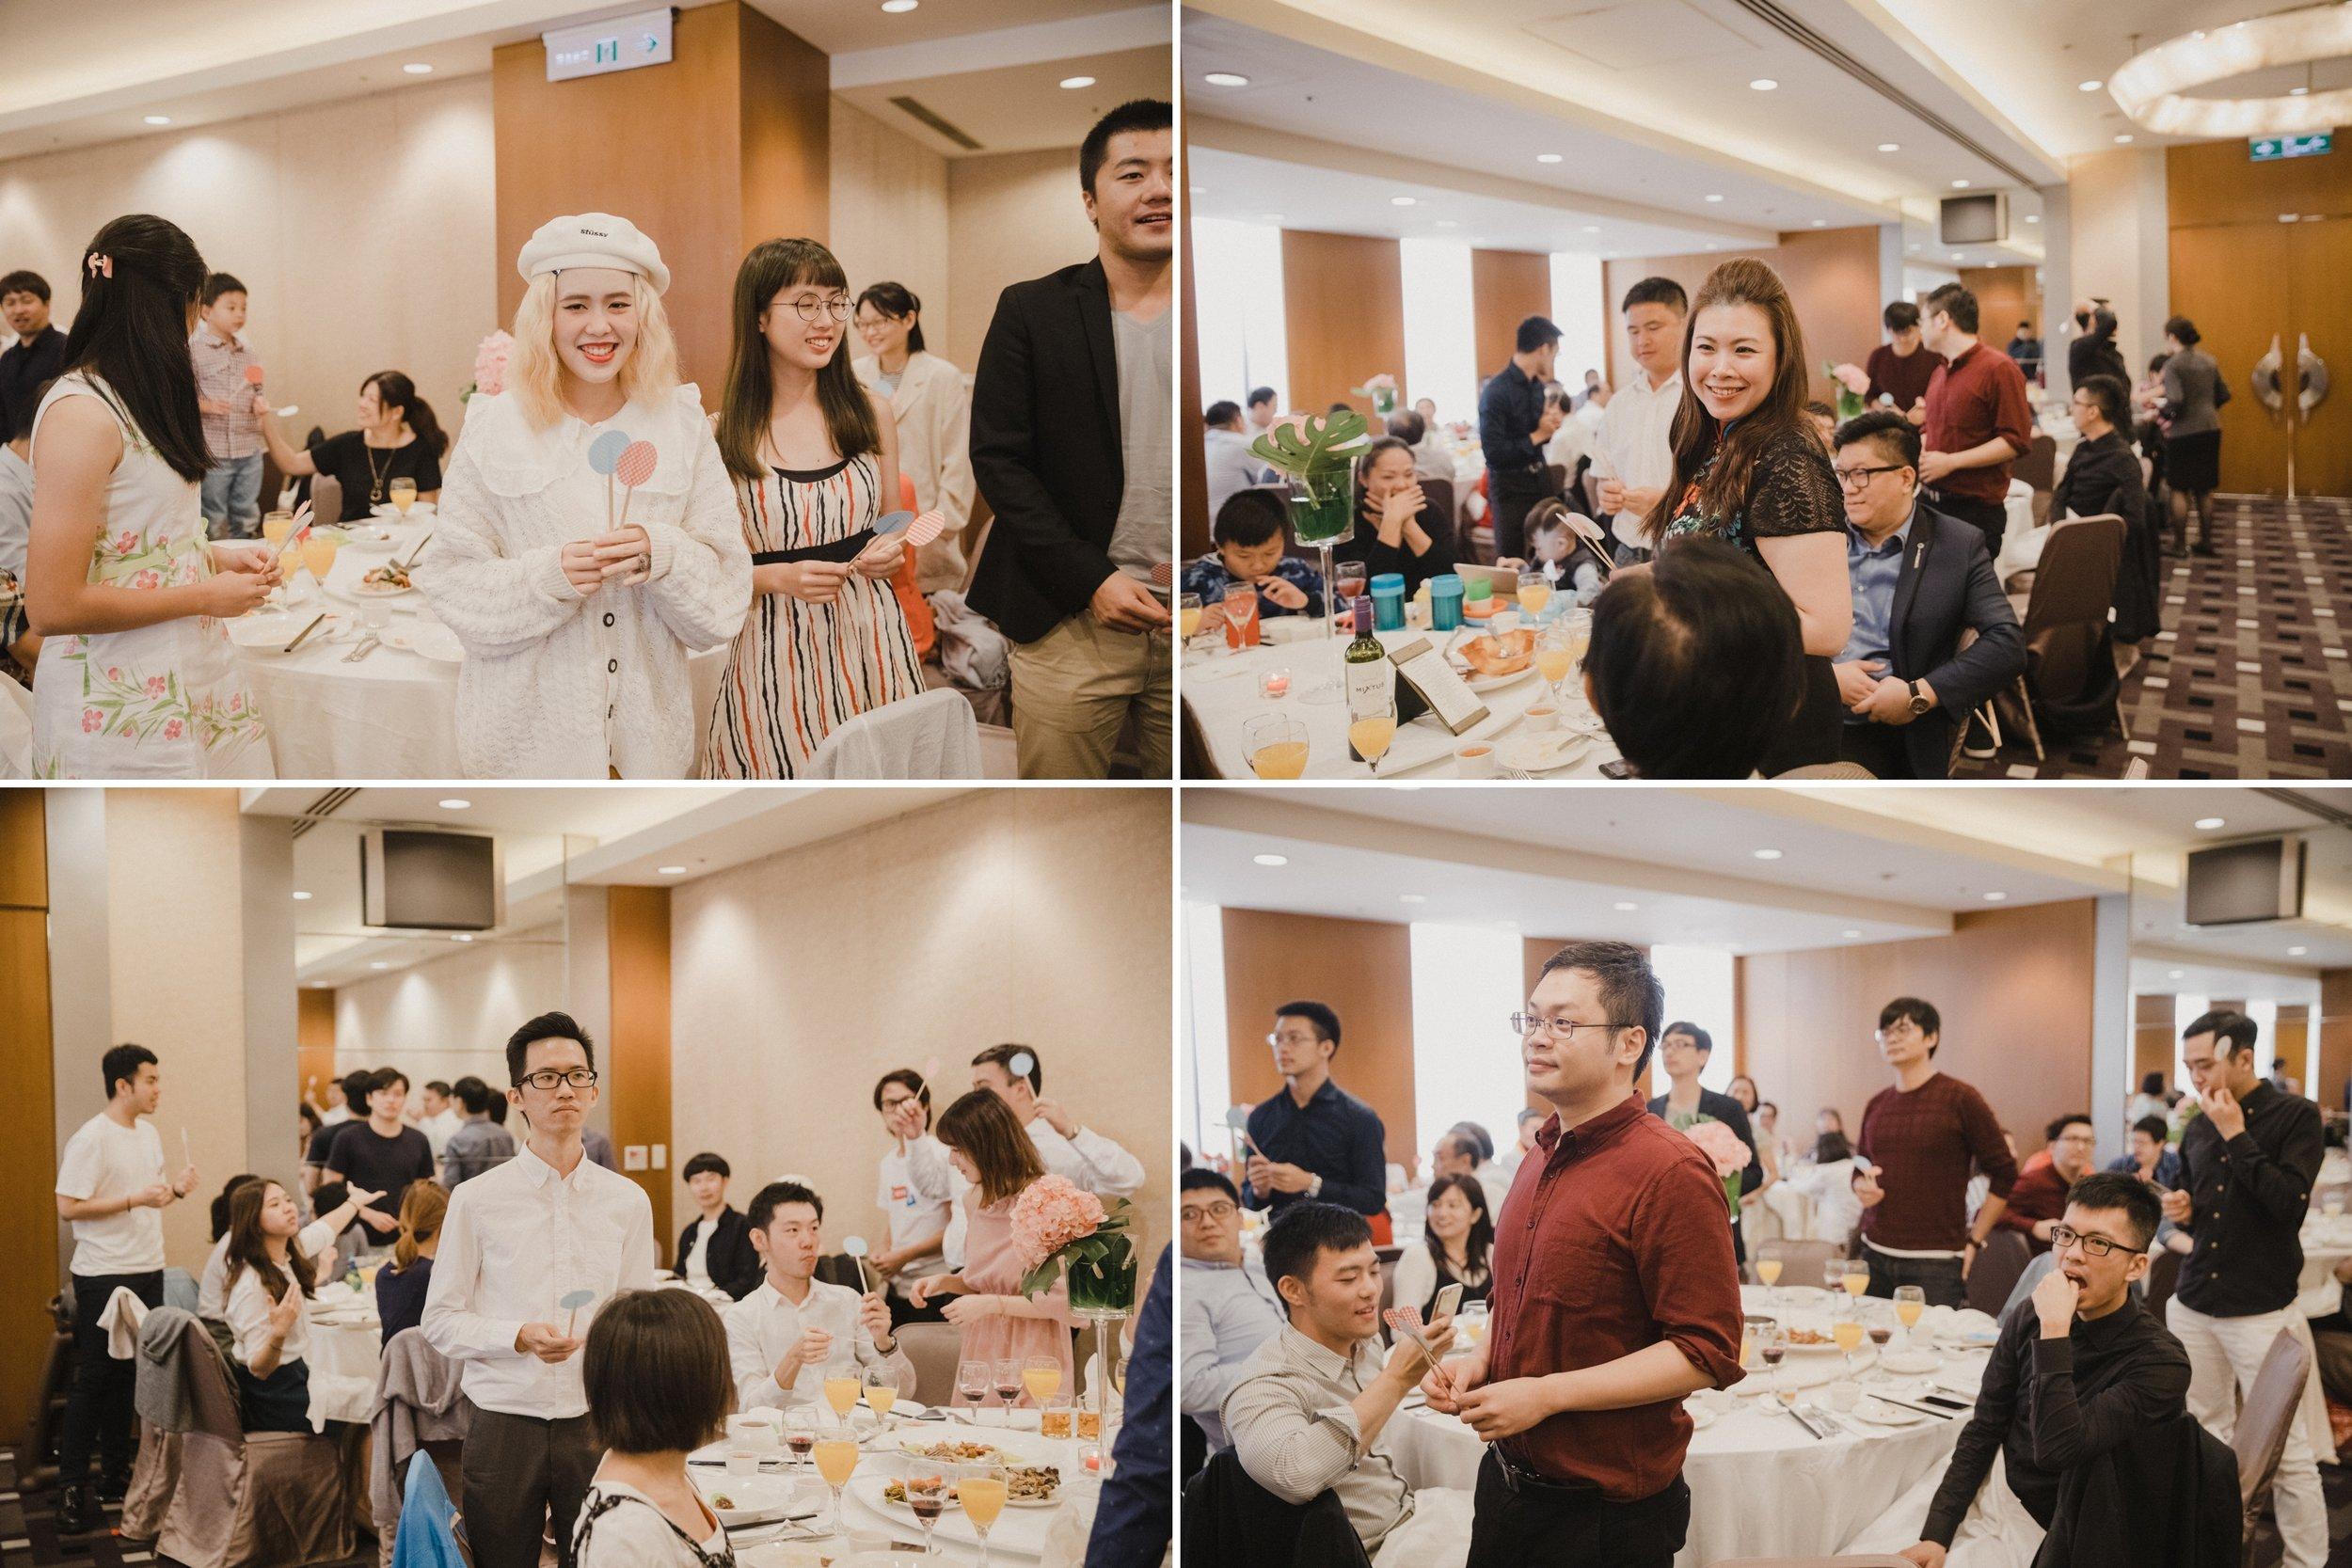 wedding-caridee-oscar-lunch-ambassador-hsinchu-結婚午宴-新竹國賓_125.jpg